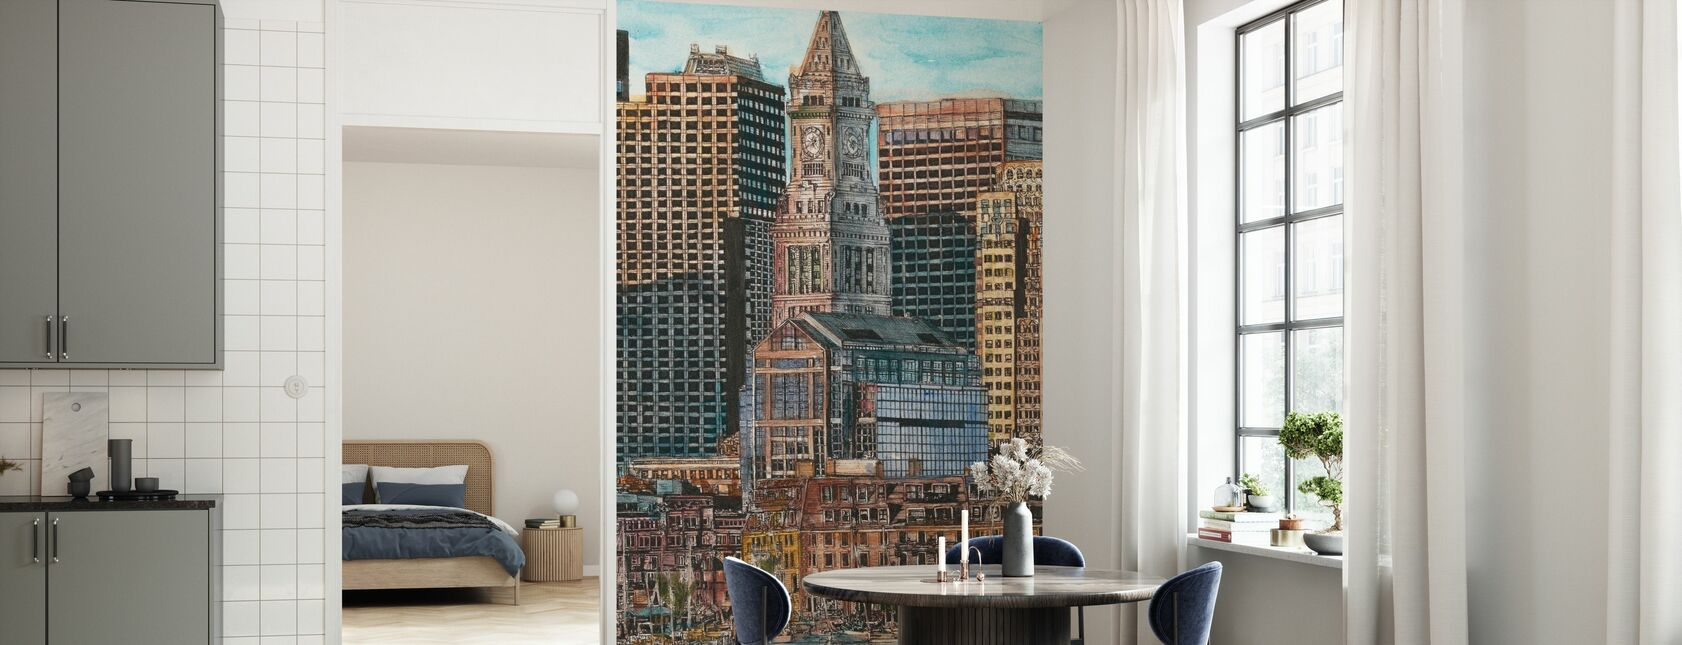 US Cityscape - Boston - Wallpaper - Kitchen